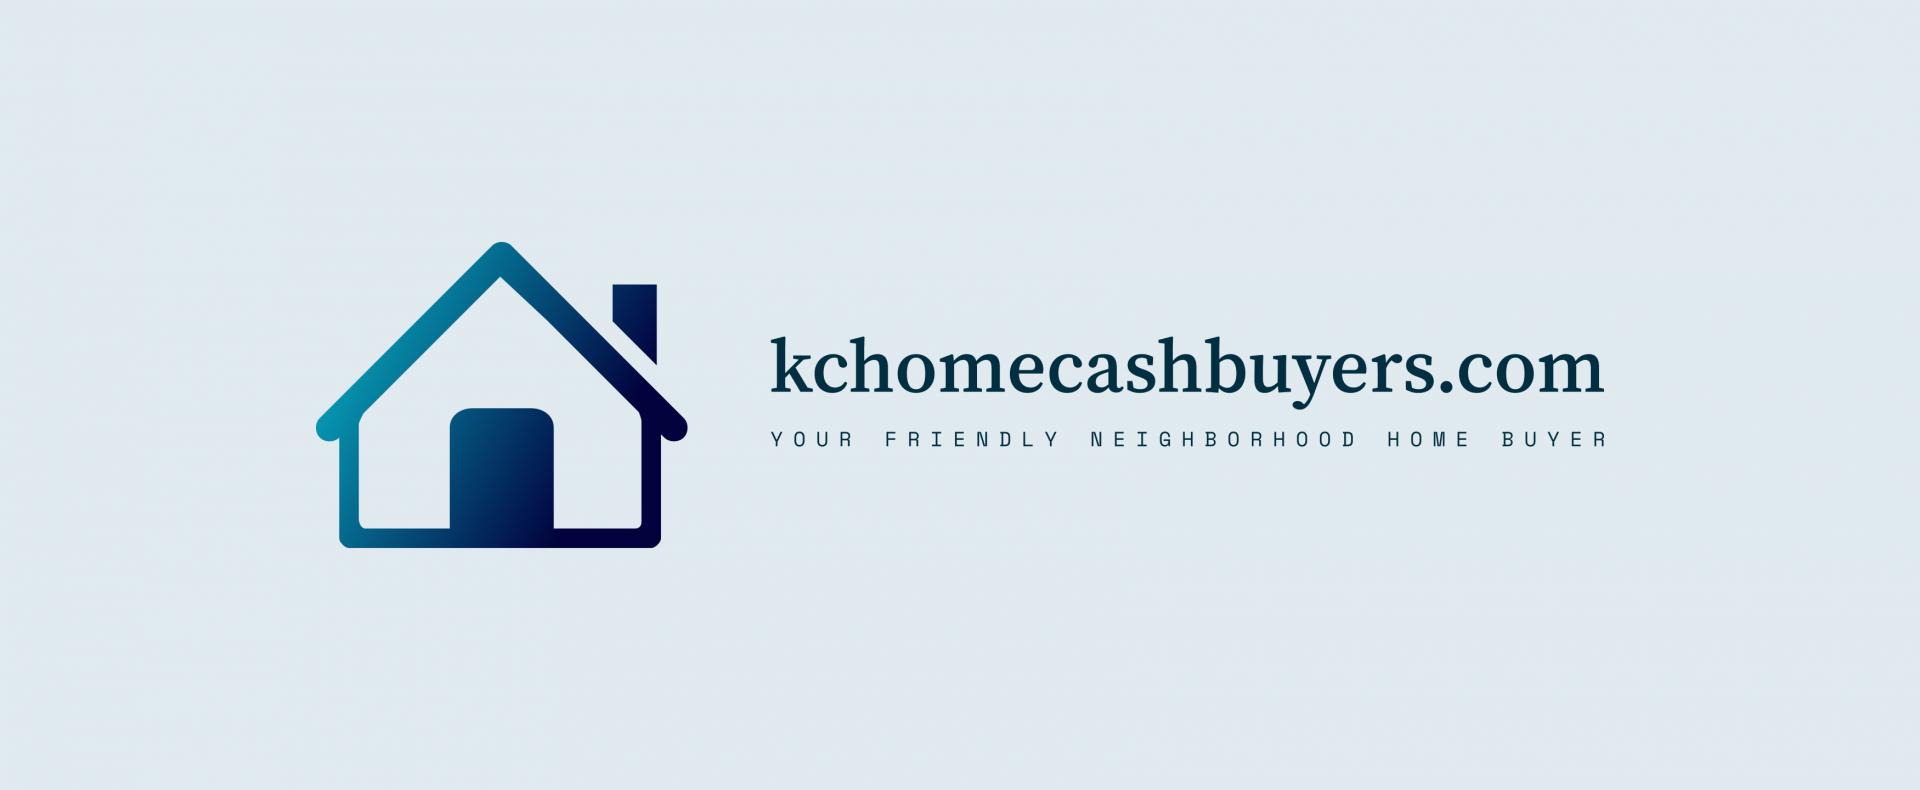 kchomecashbuyers.com logo